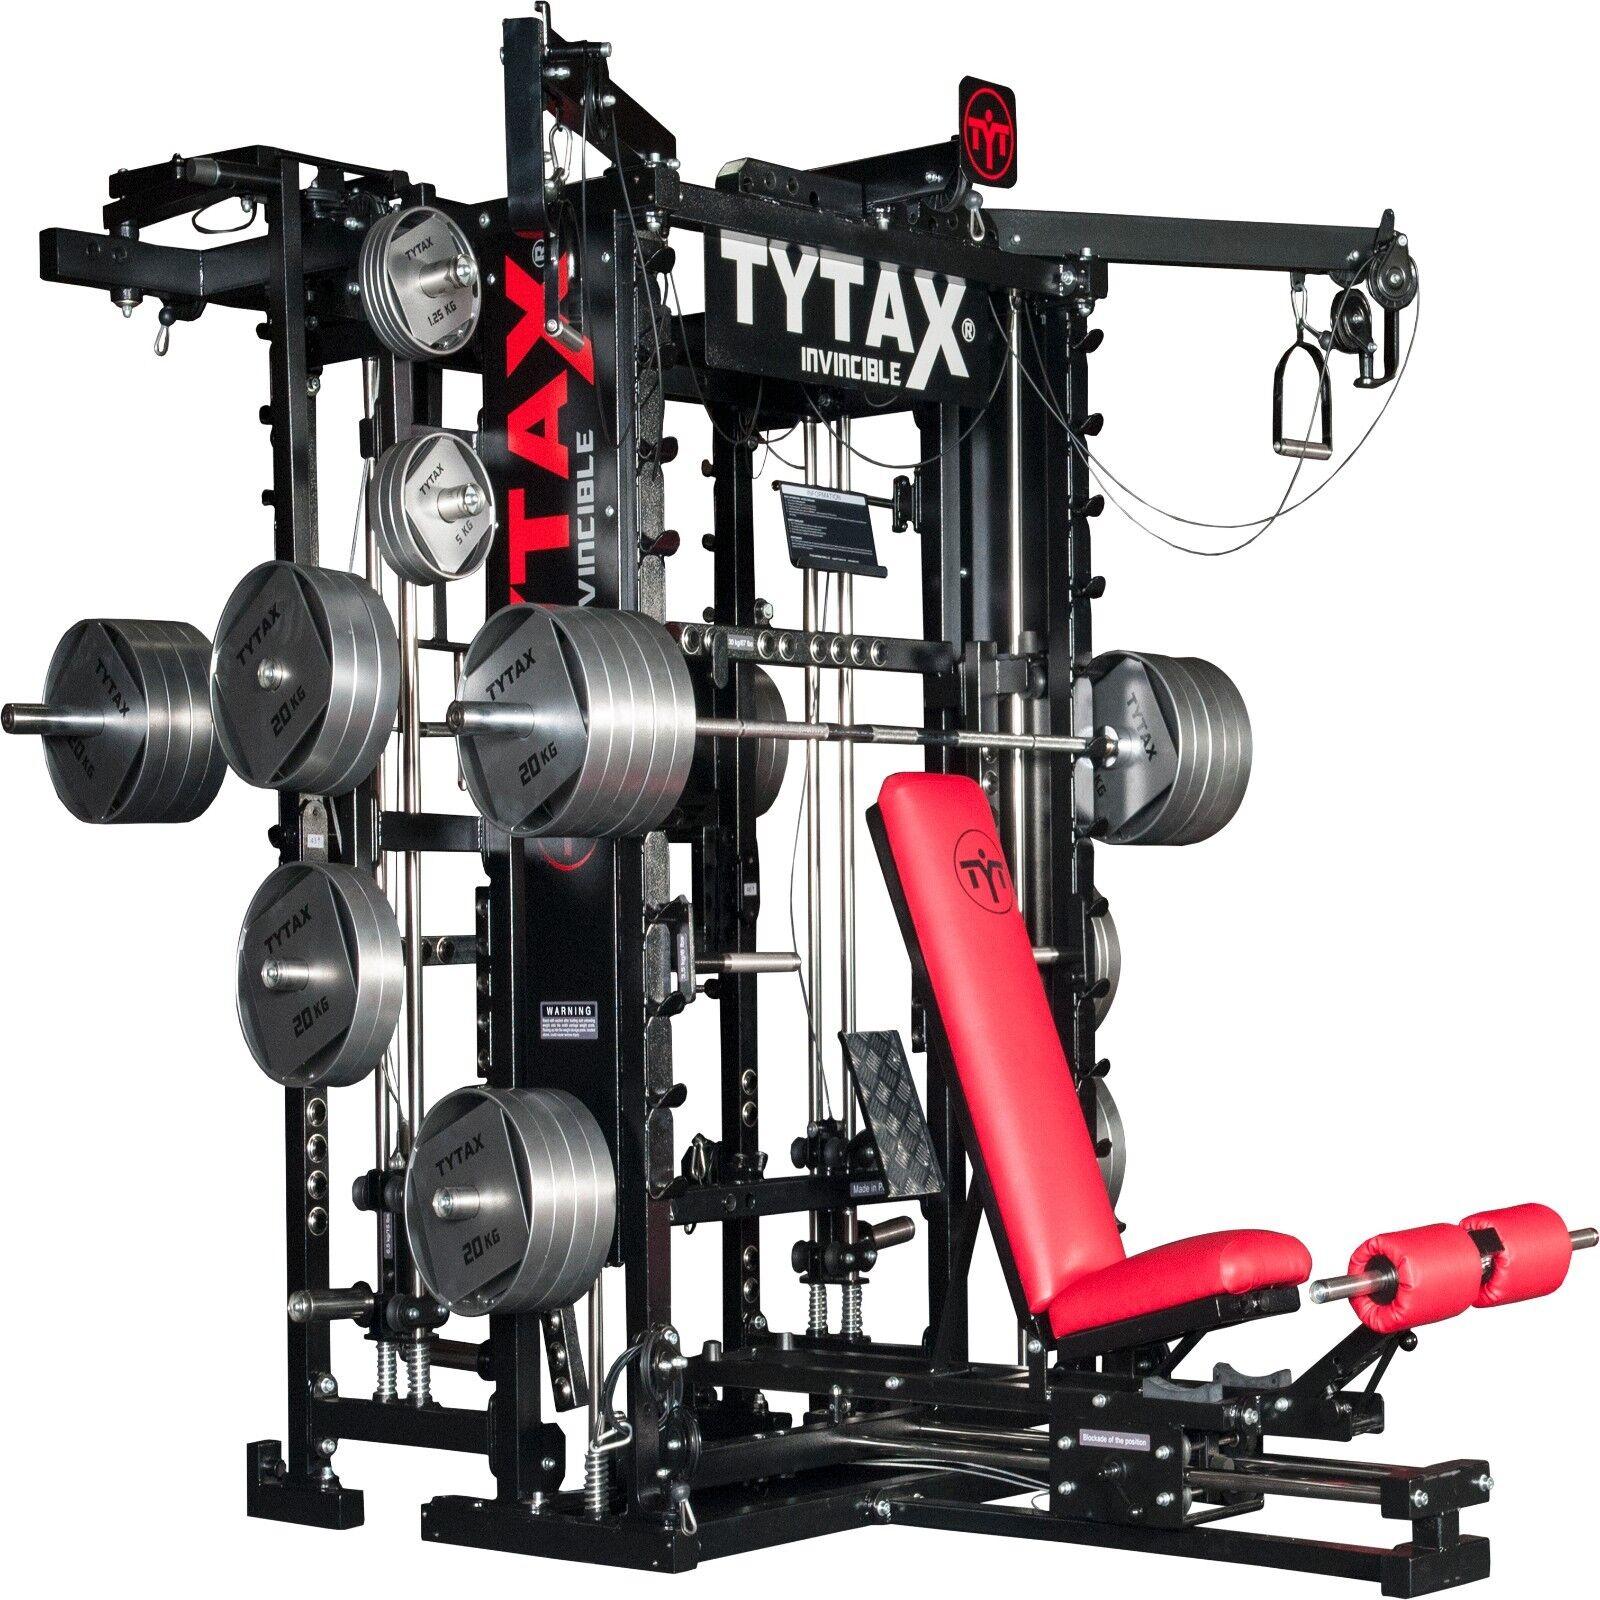 TYTAX® T1-X ULTIMATE HOME MULTI GYM MACHINE EQUIPMENT GARAG